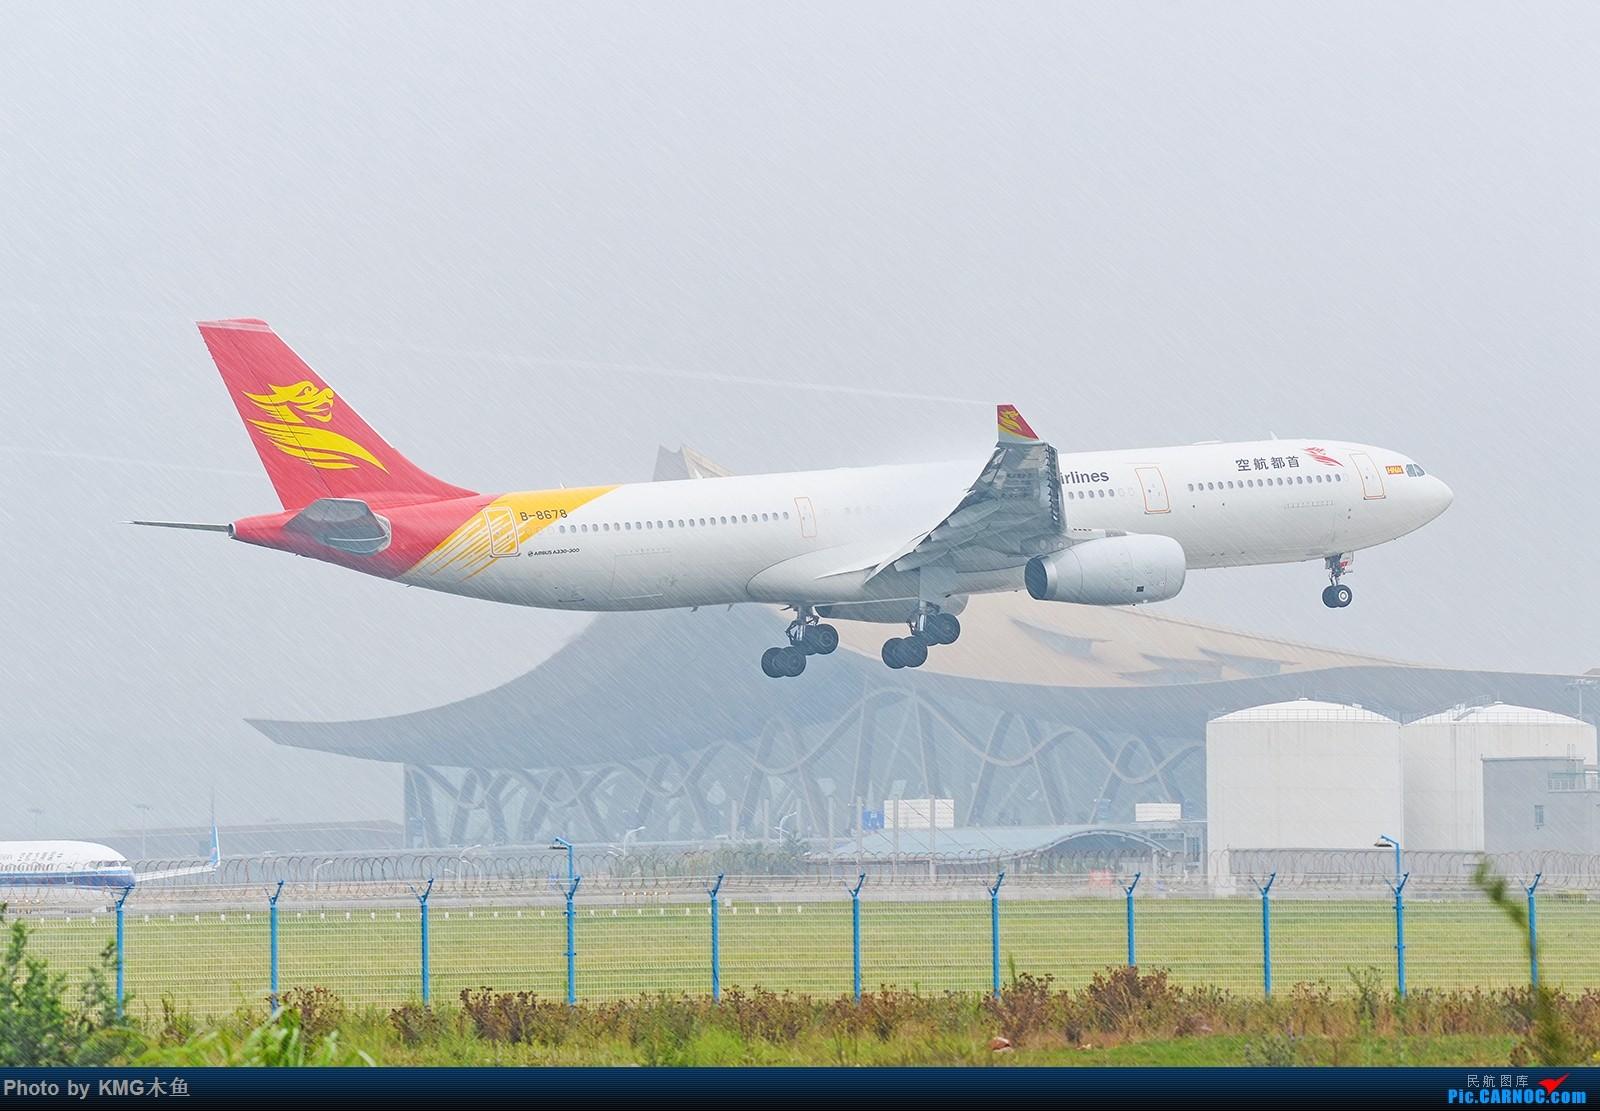 Re:[原创]【昆明长水国际机场——KMG木鱼拍机】昆明接二连三的阴雨天,形成了好货烂天有,烂天必有好货的奇特现象 AIRBUS A330-300 B-8678 中国昆明长水国际机场